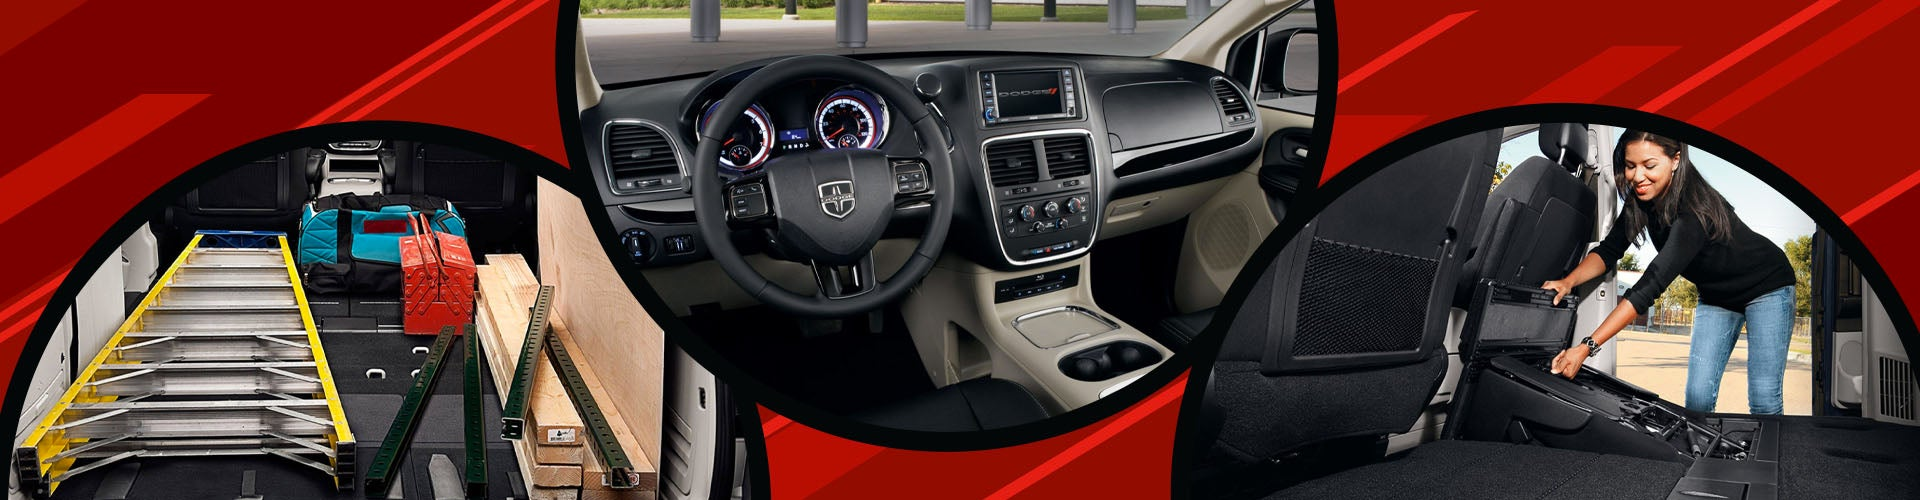 2020 Dodge Grand Caravan Millsboro Chrysler Dodge Jeep Ram